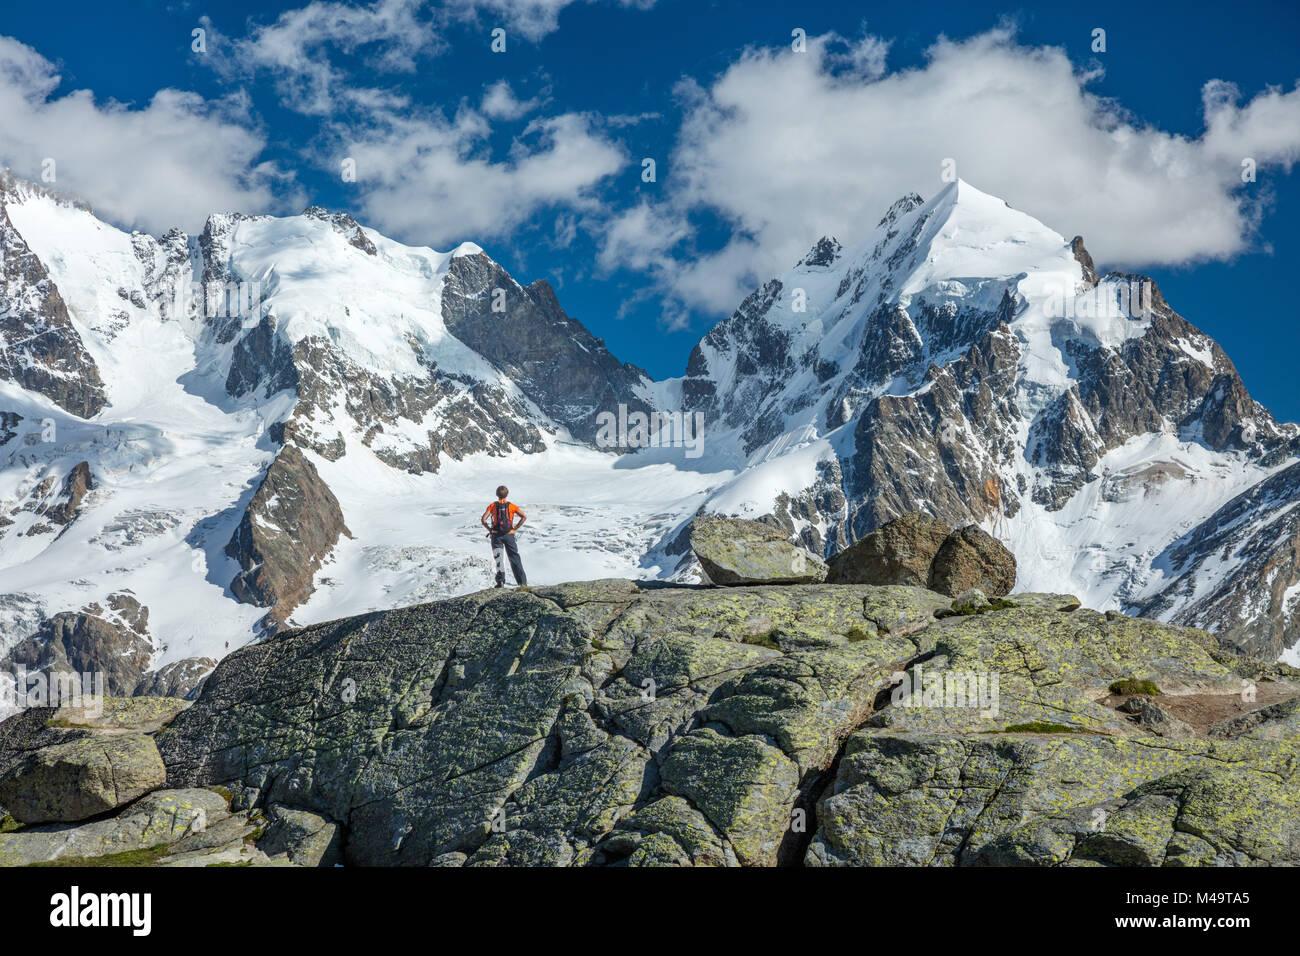 Wanderer unter Piz Bernina und Piz Rosbeg, Fuorcla Surlej, Berniner Alpen, Graubünden, Schweiz. Stockbild